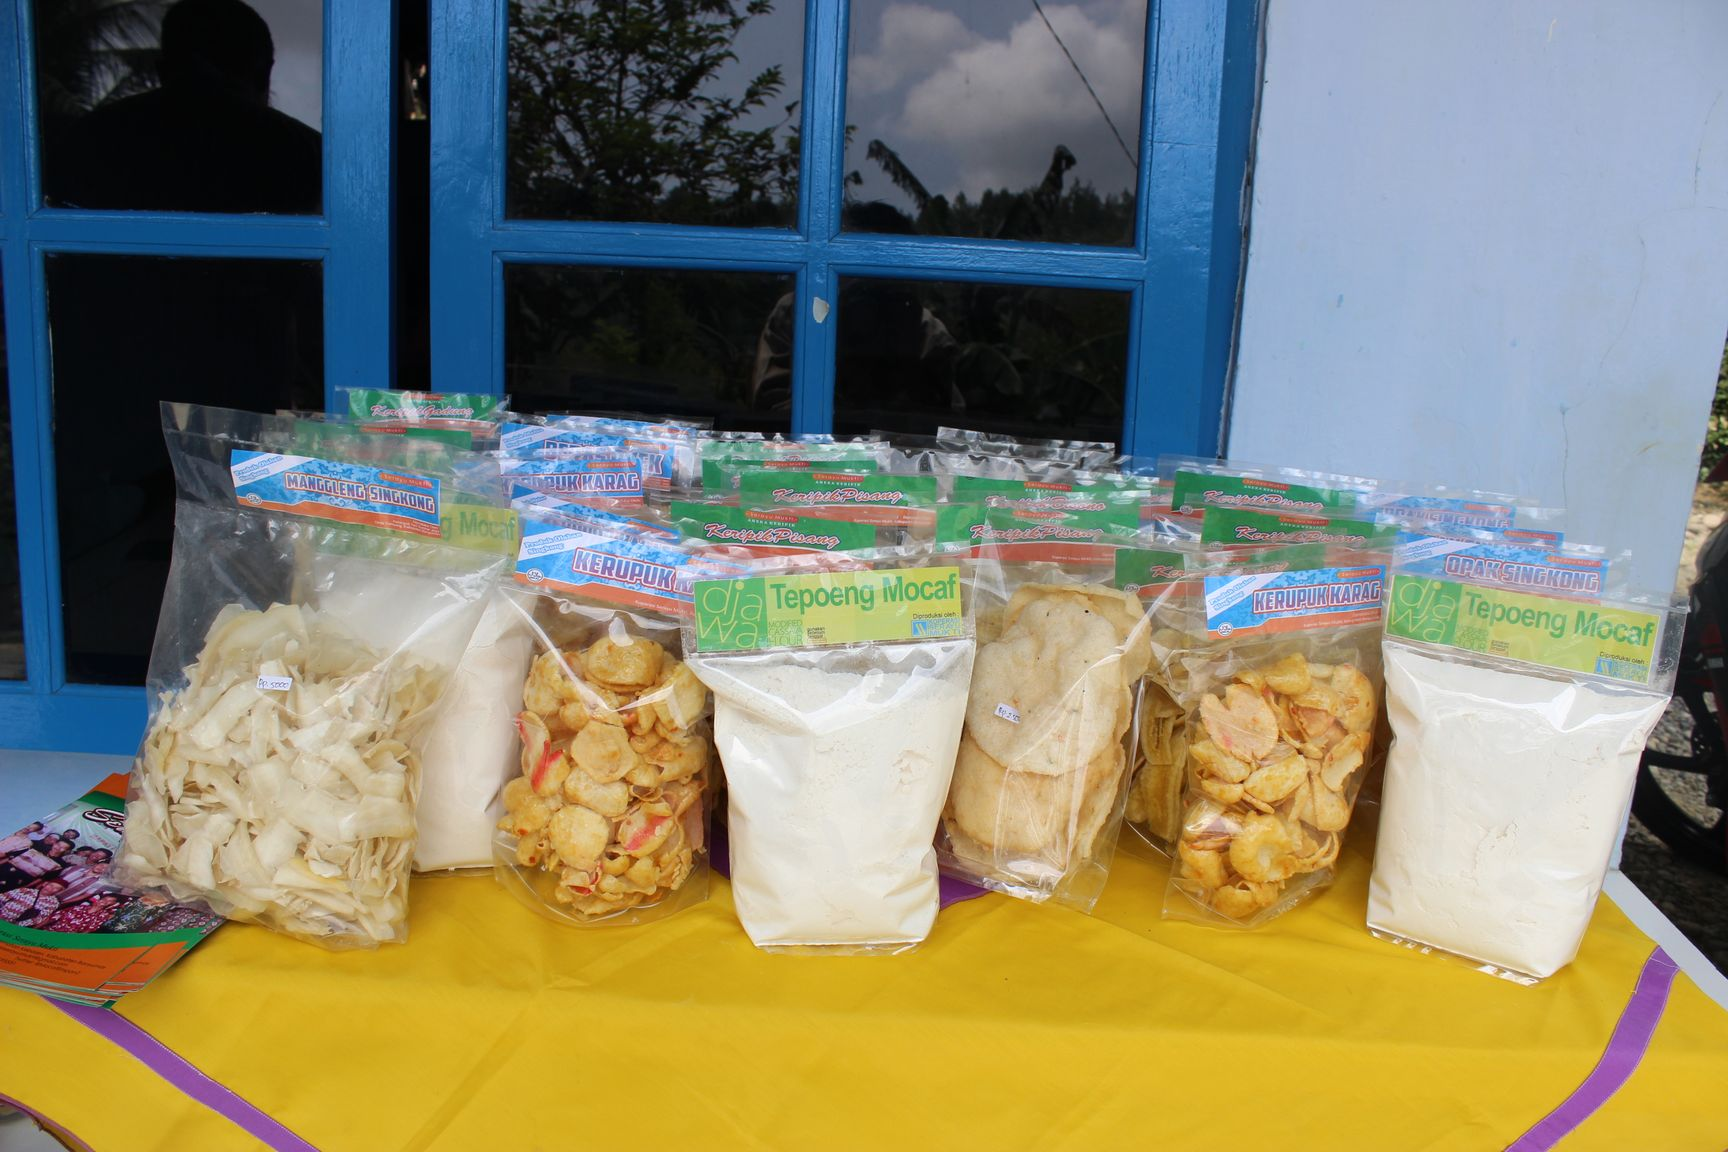 Produk olahan singkong Koperasi Serayu Mukti yang dapat menjadi media promosi Kampung Mocaf